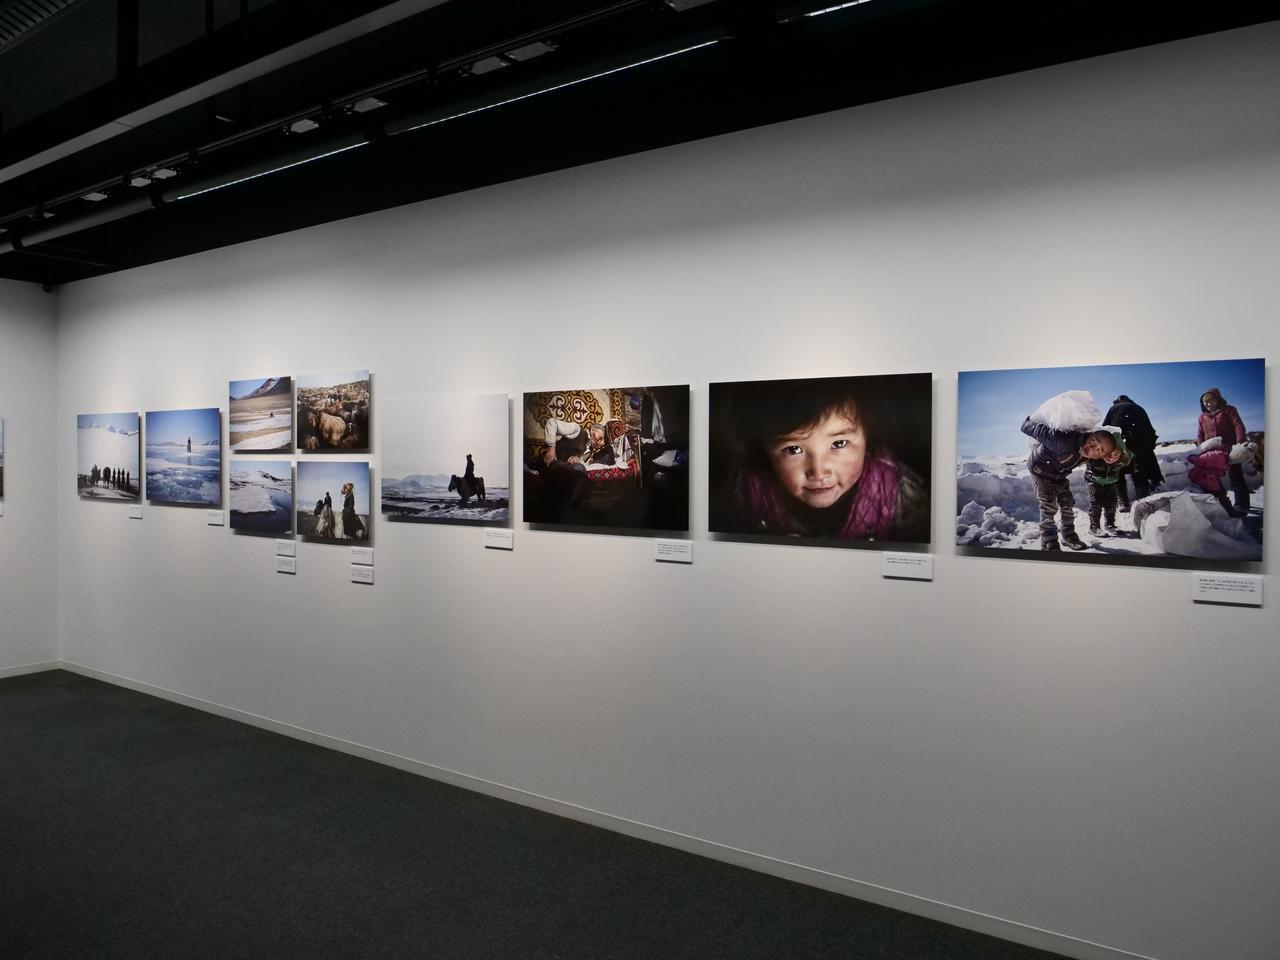 画像2: 展示作品の様子